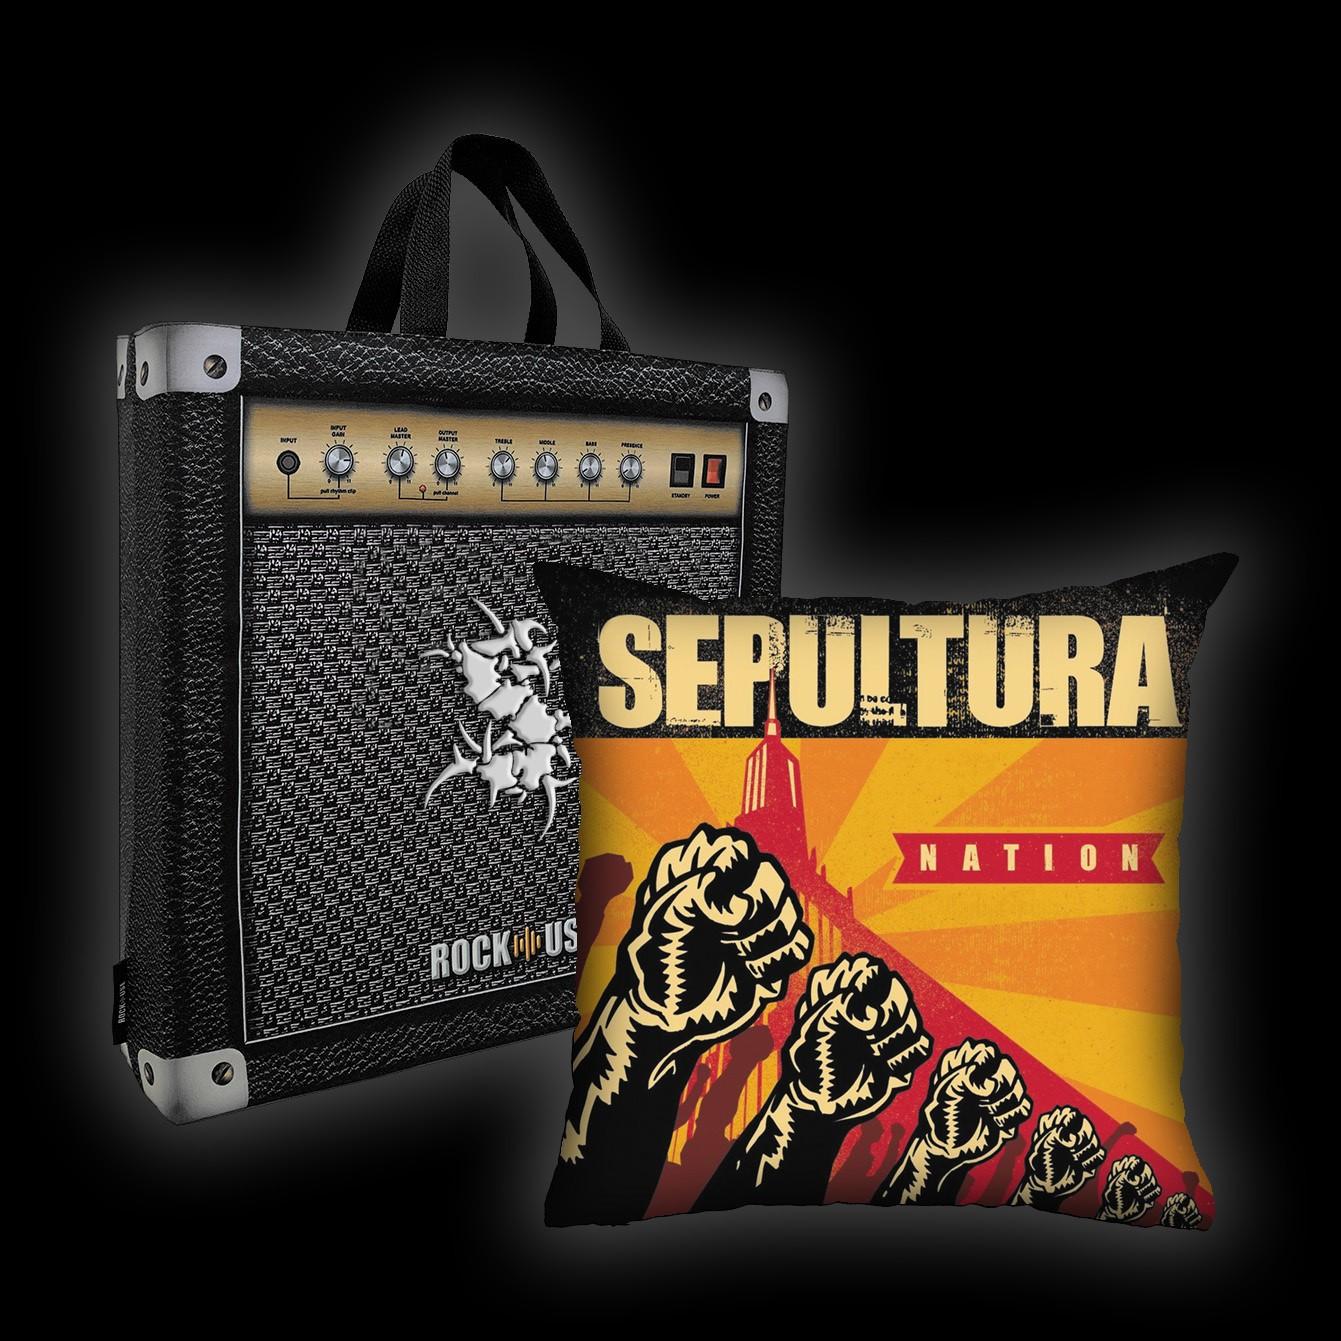 Kit Almofada & Sacola Sepultura - Nation